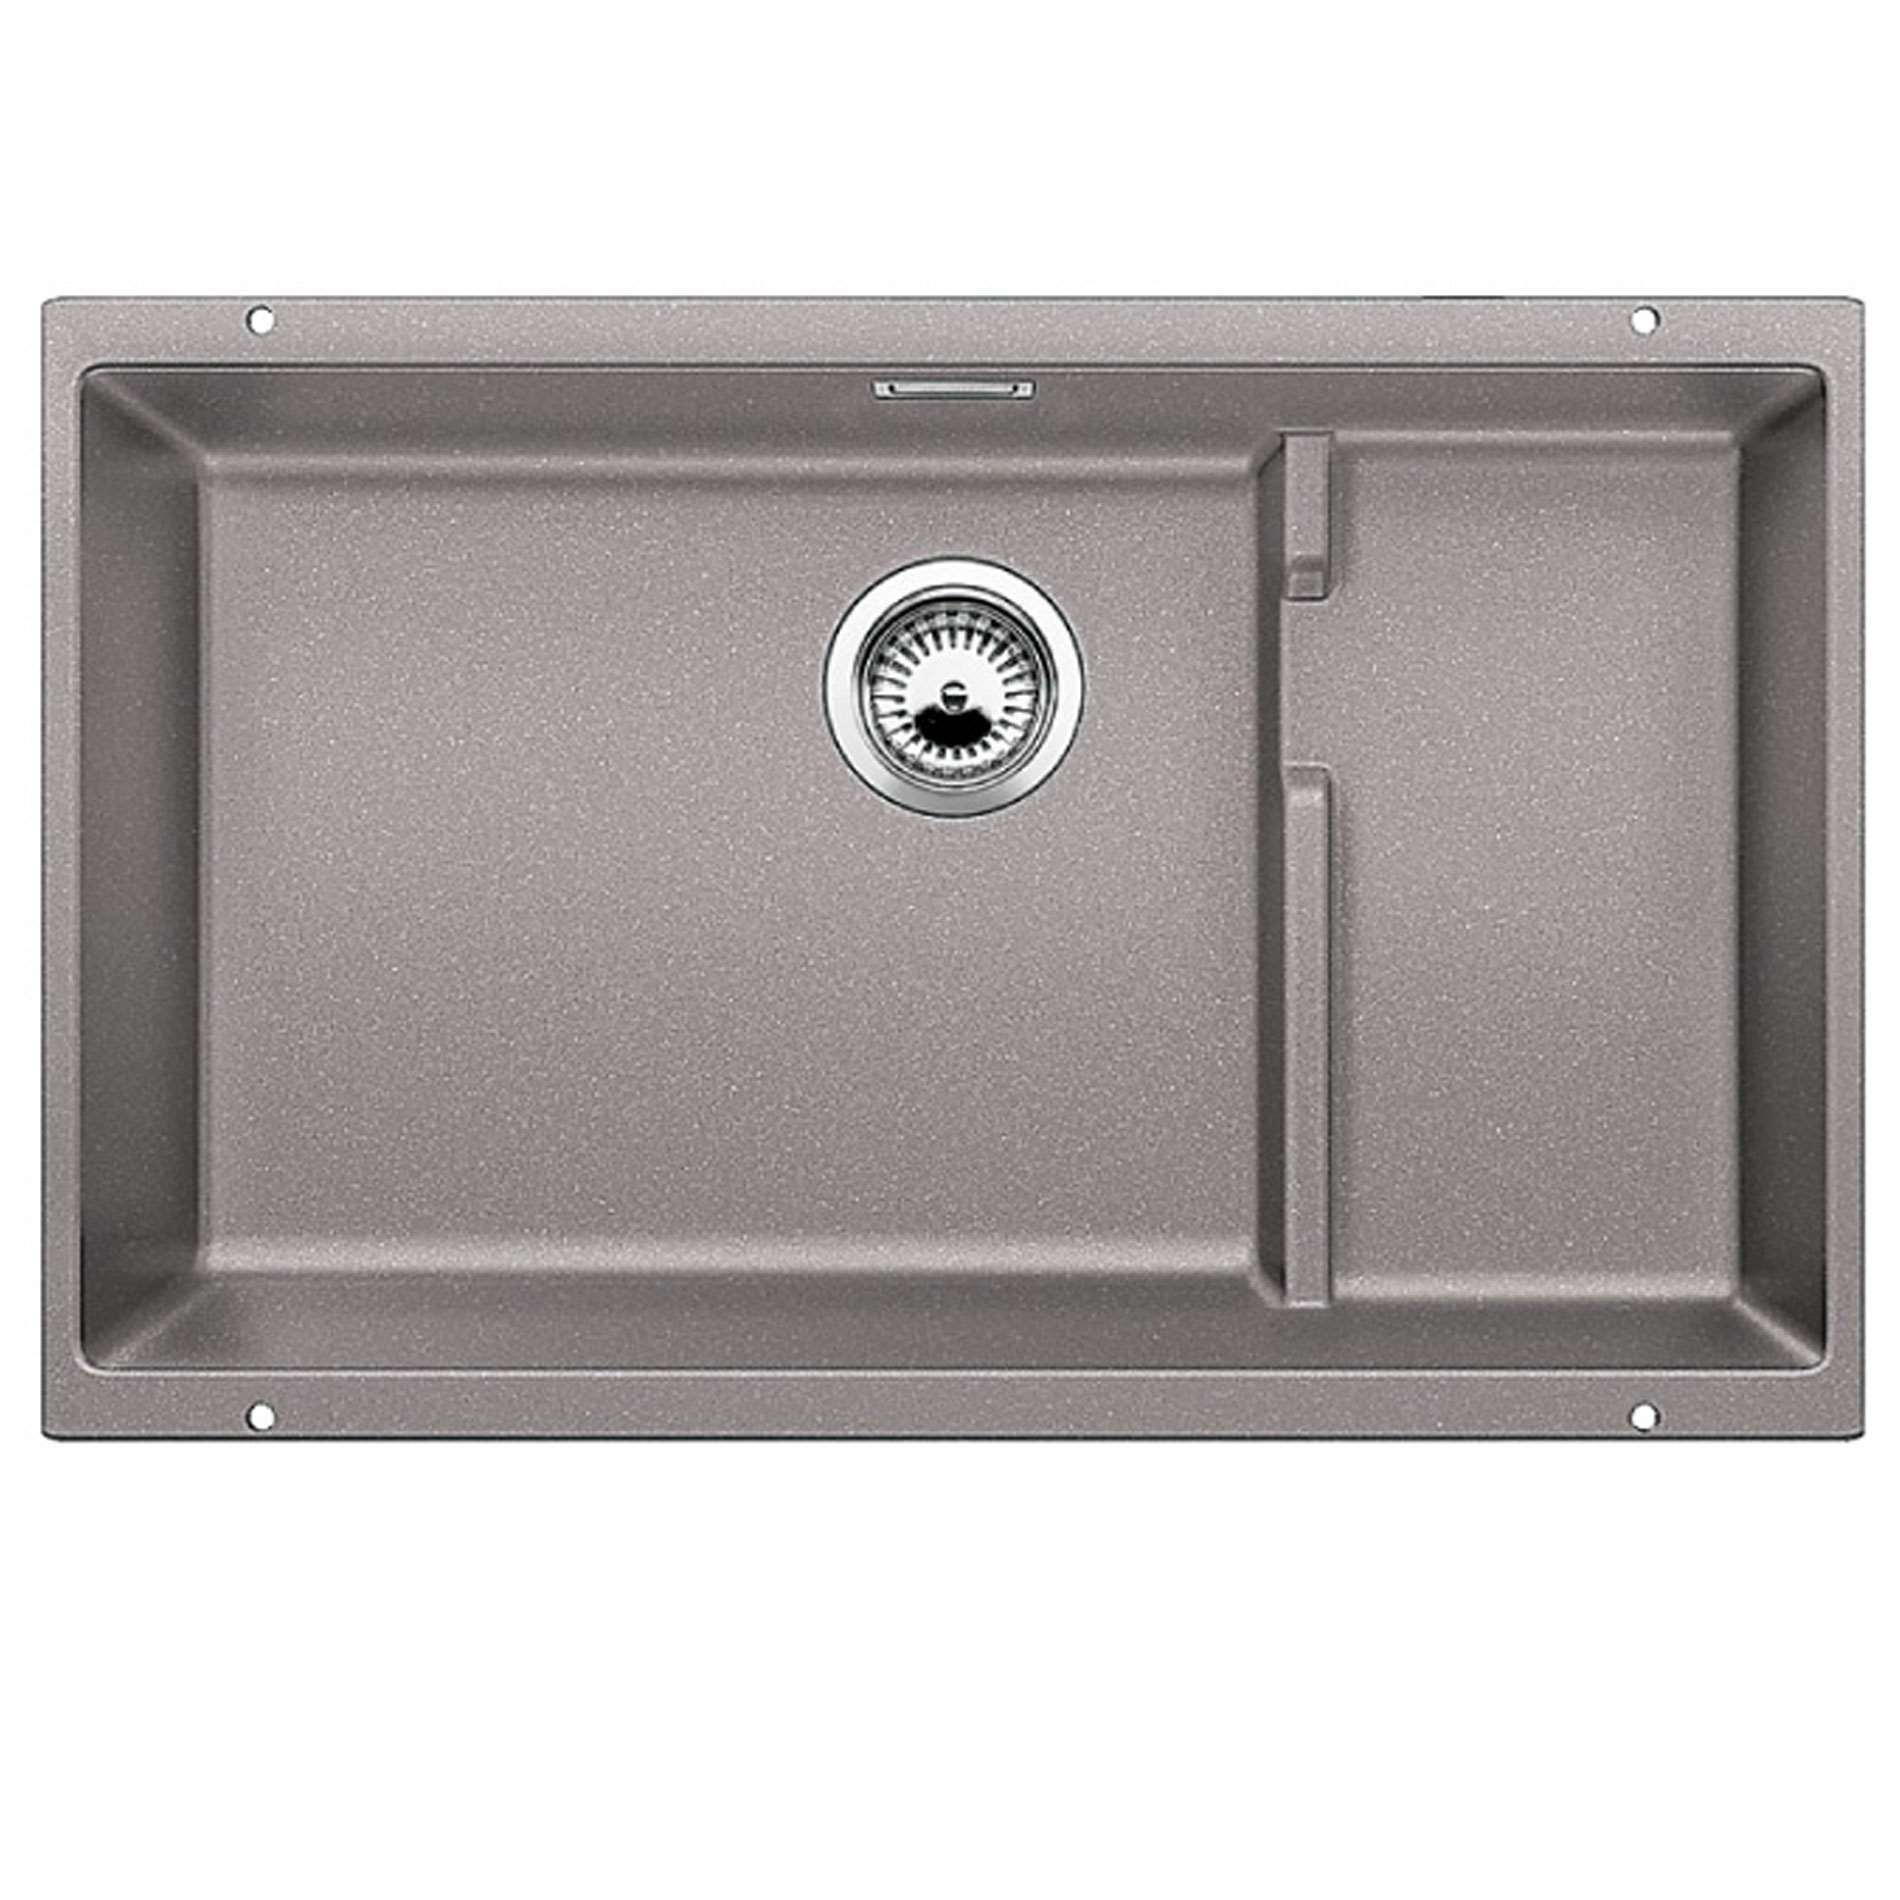 Blanco Subline 700 U Level Alumetallic Silgranit Sink Kitchen